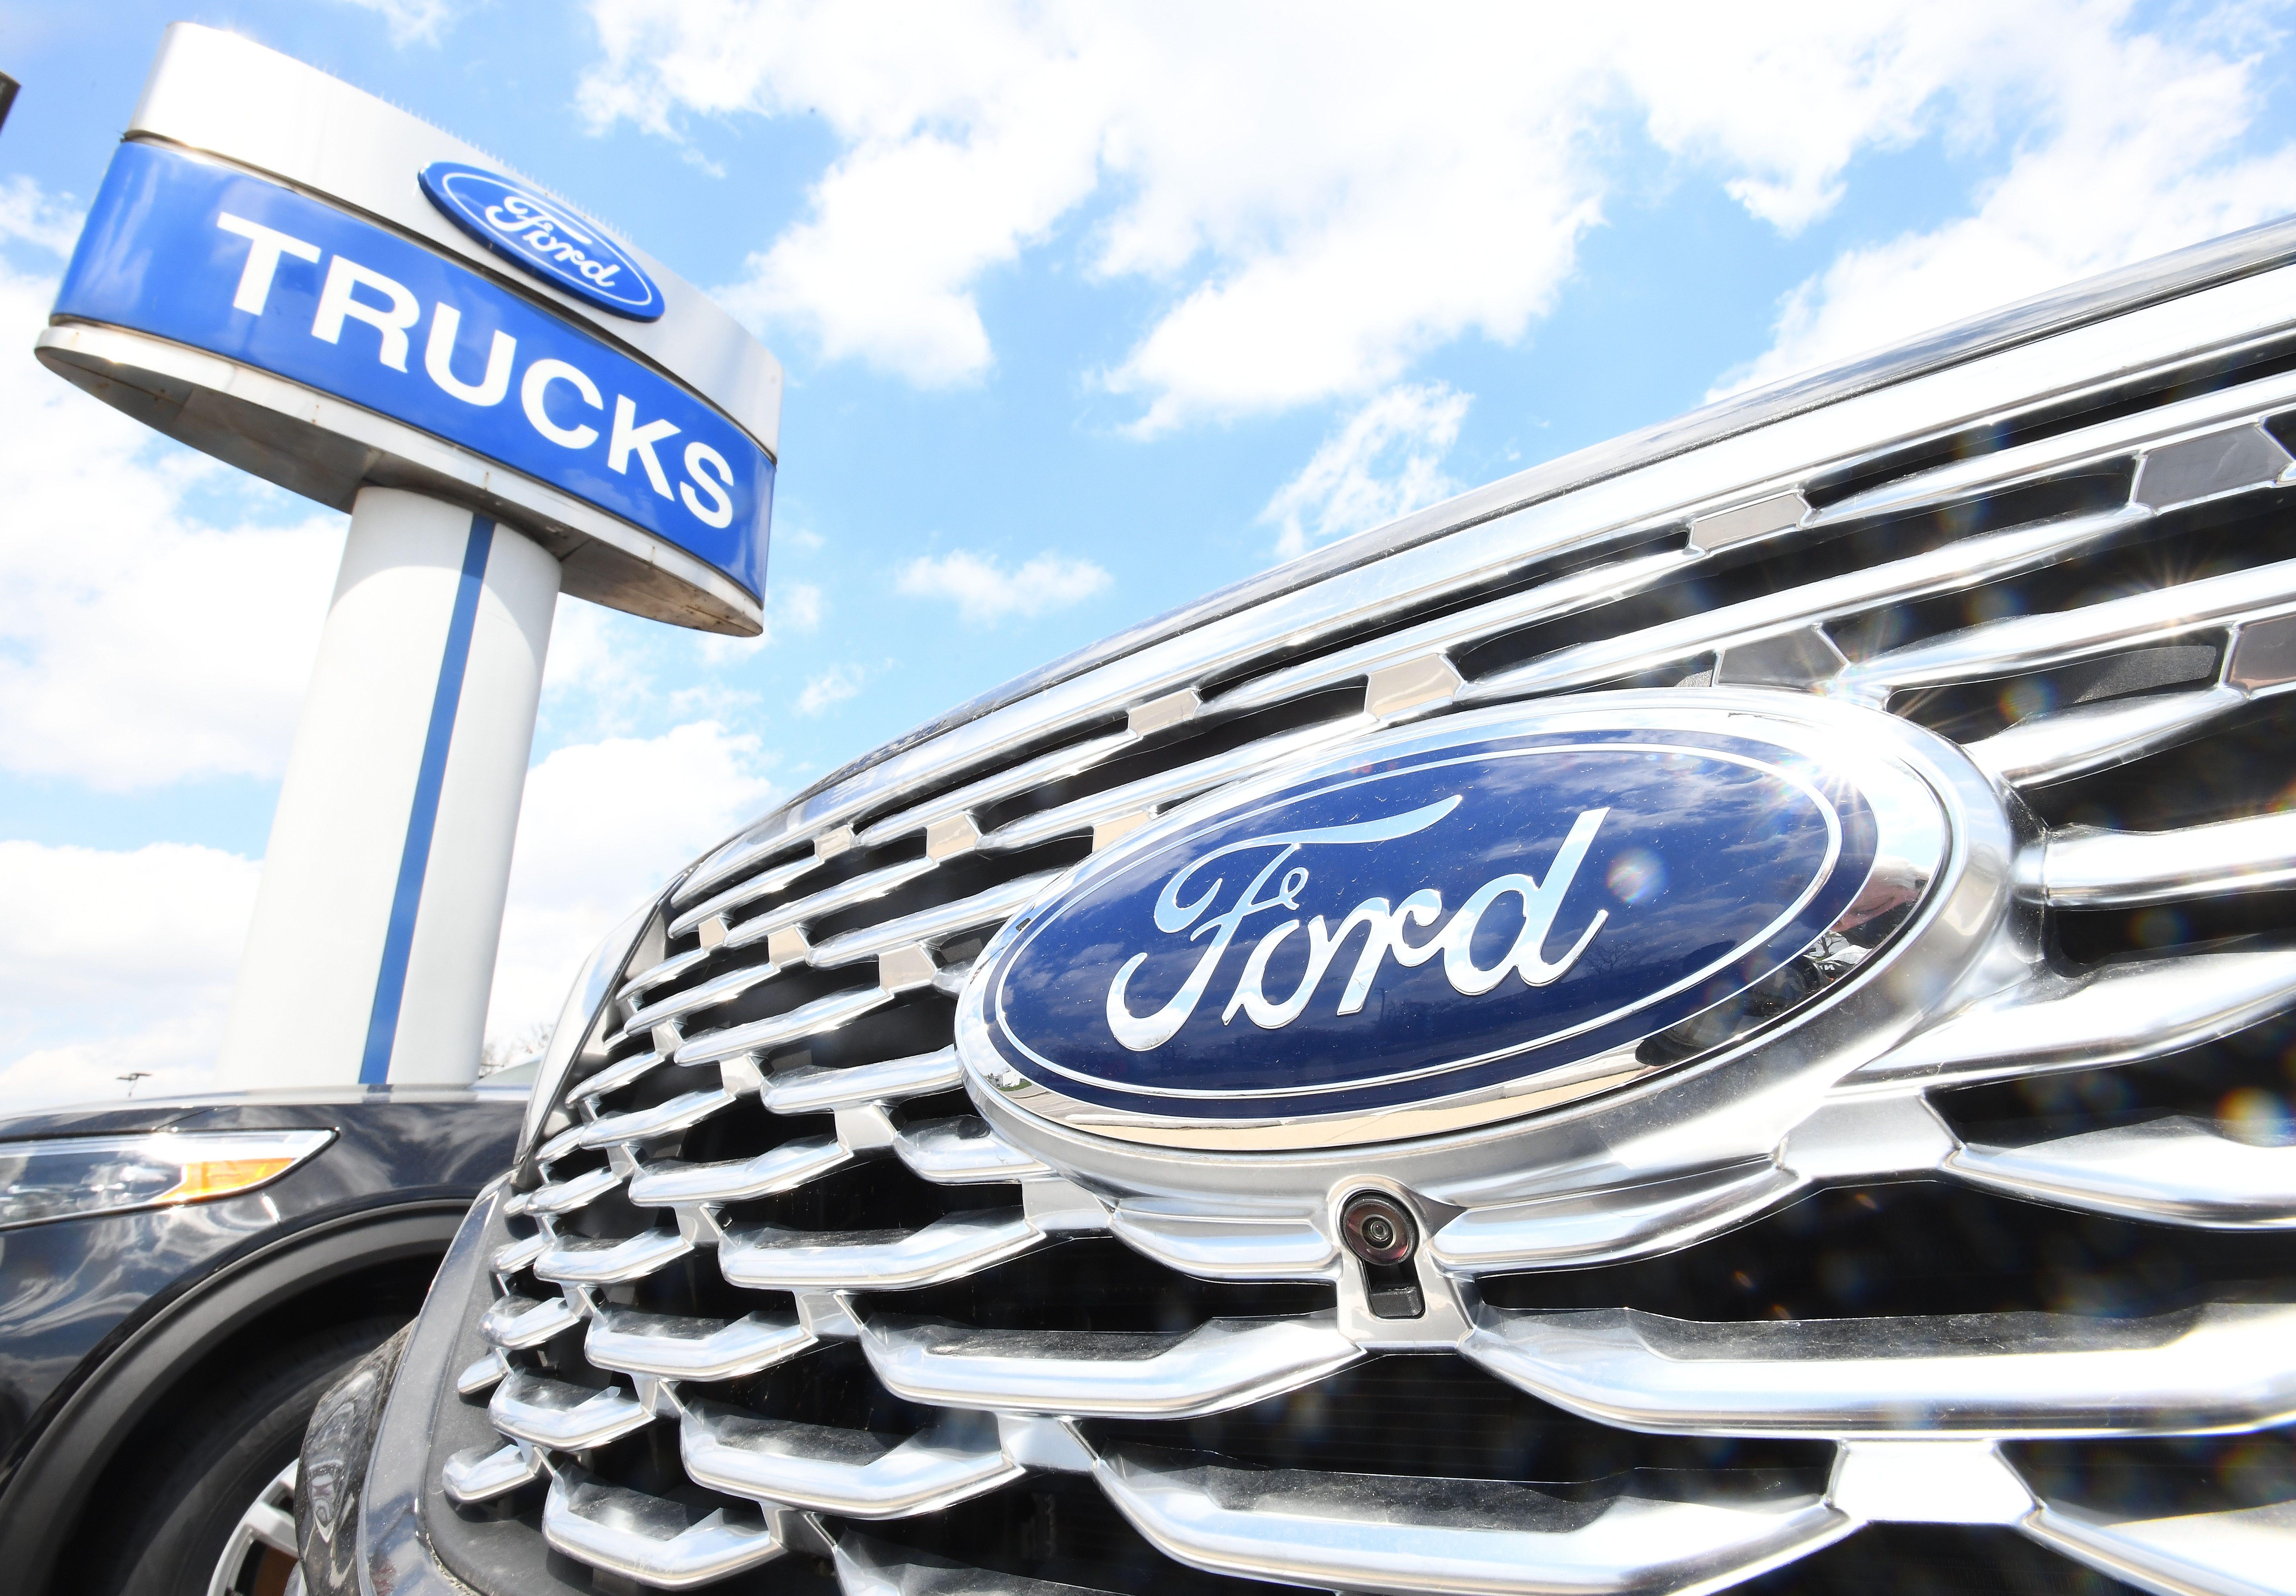 Ford announces recall of more than 660K Explorer SUVs